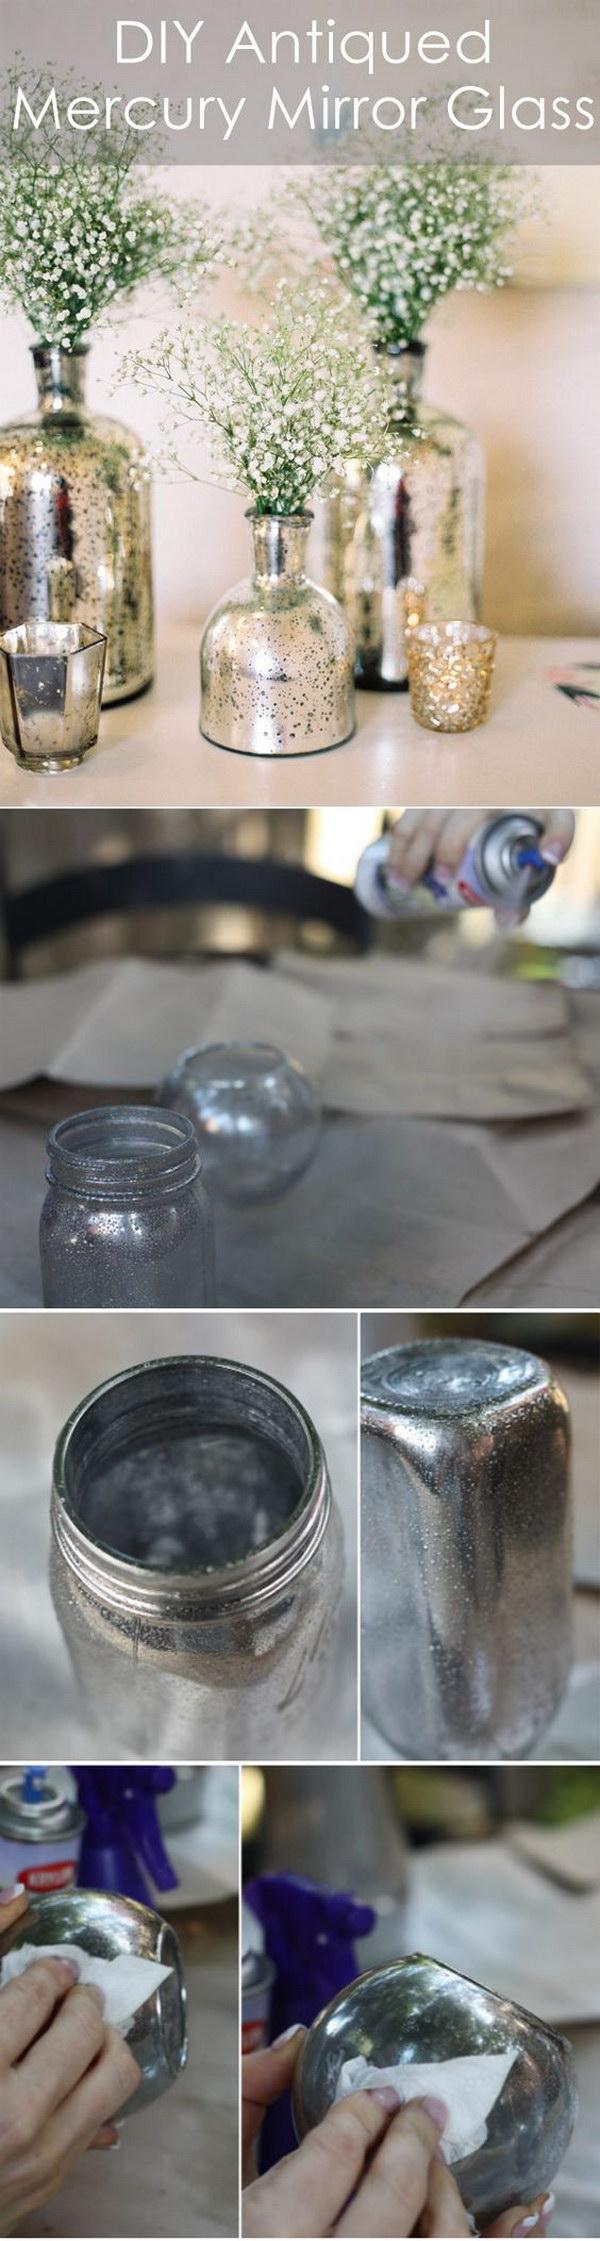 DIY Antiqued Mercury Mirror Glass Wedding Centerpieces.